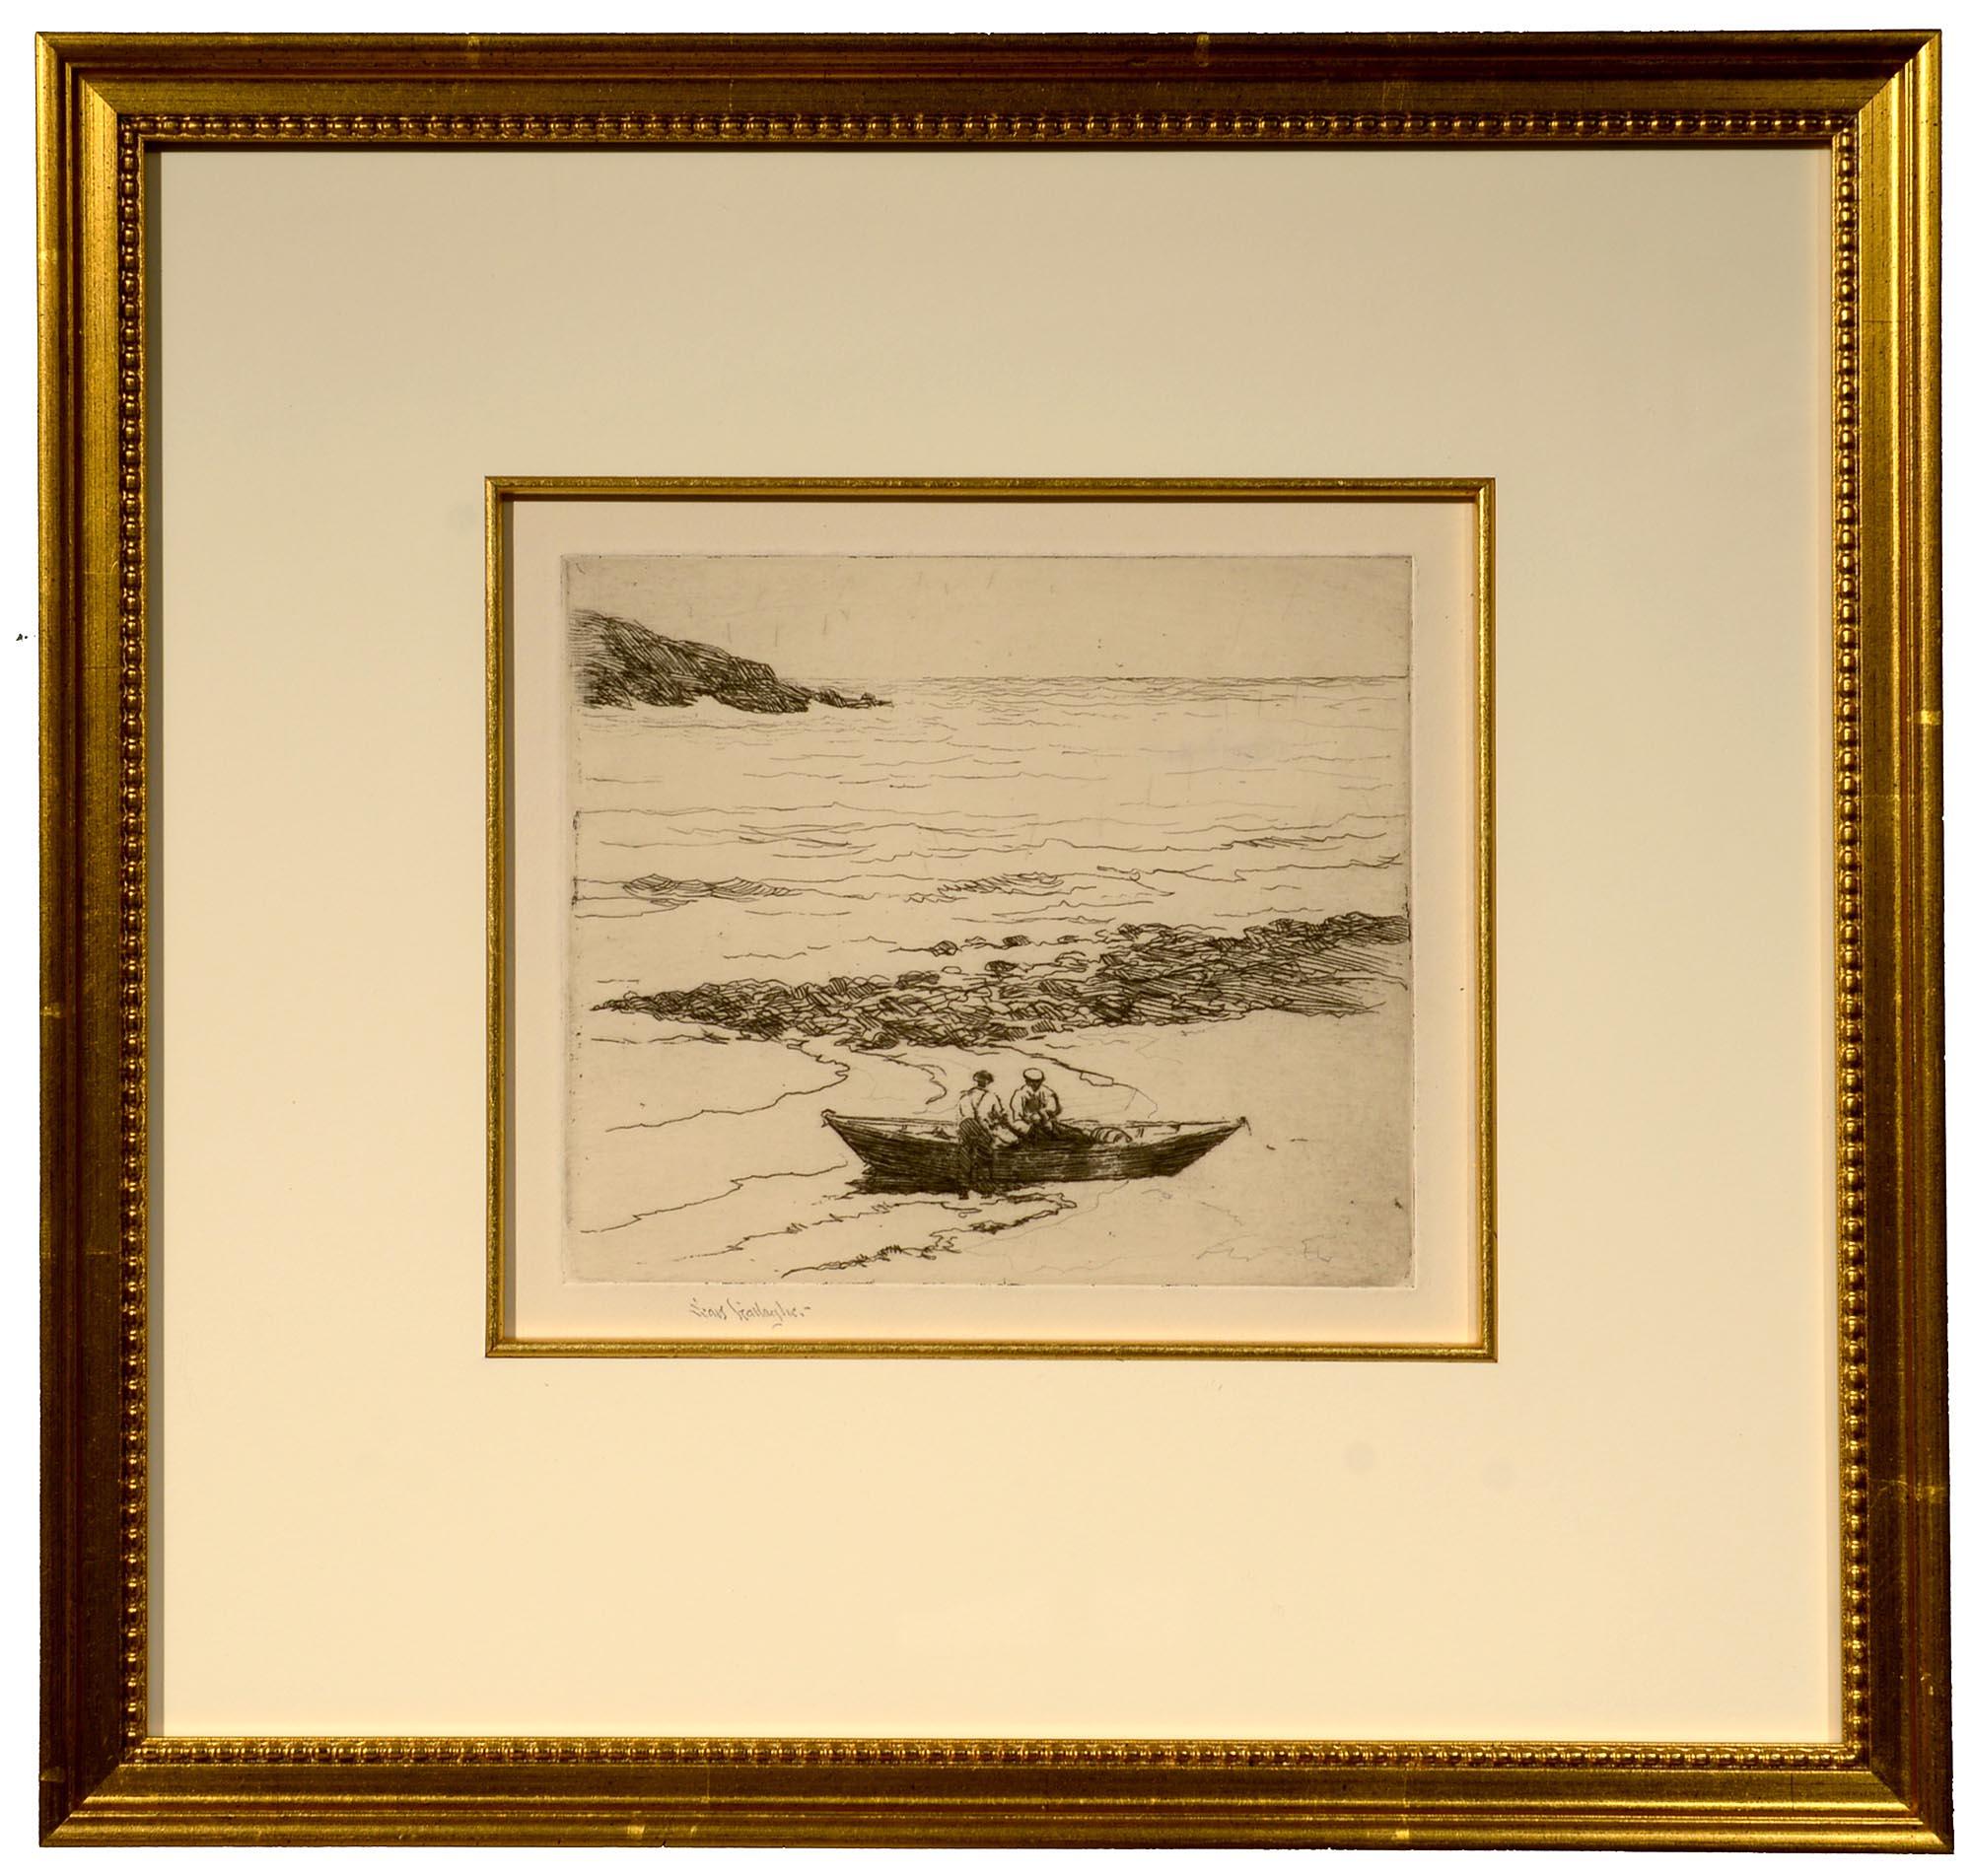 Sears Gallagher Fishermen, Fish Beach, Monhegan framed